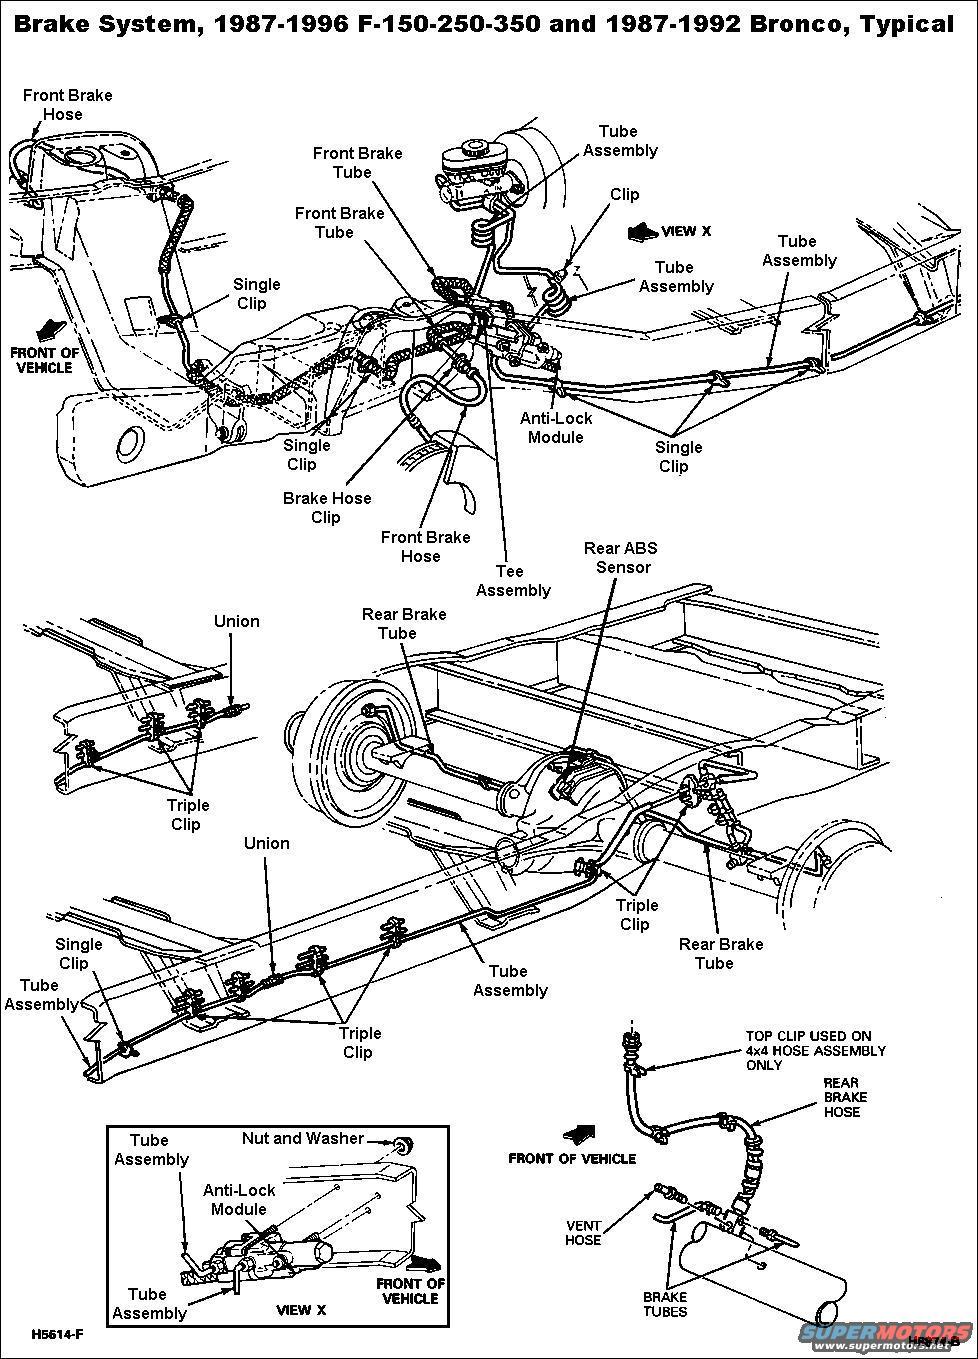 Knock Sensor Code Z06vettecom Corvette Yamaha Boat Tachometer Wiring ...